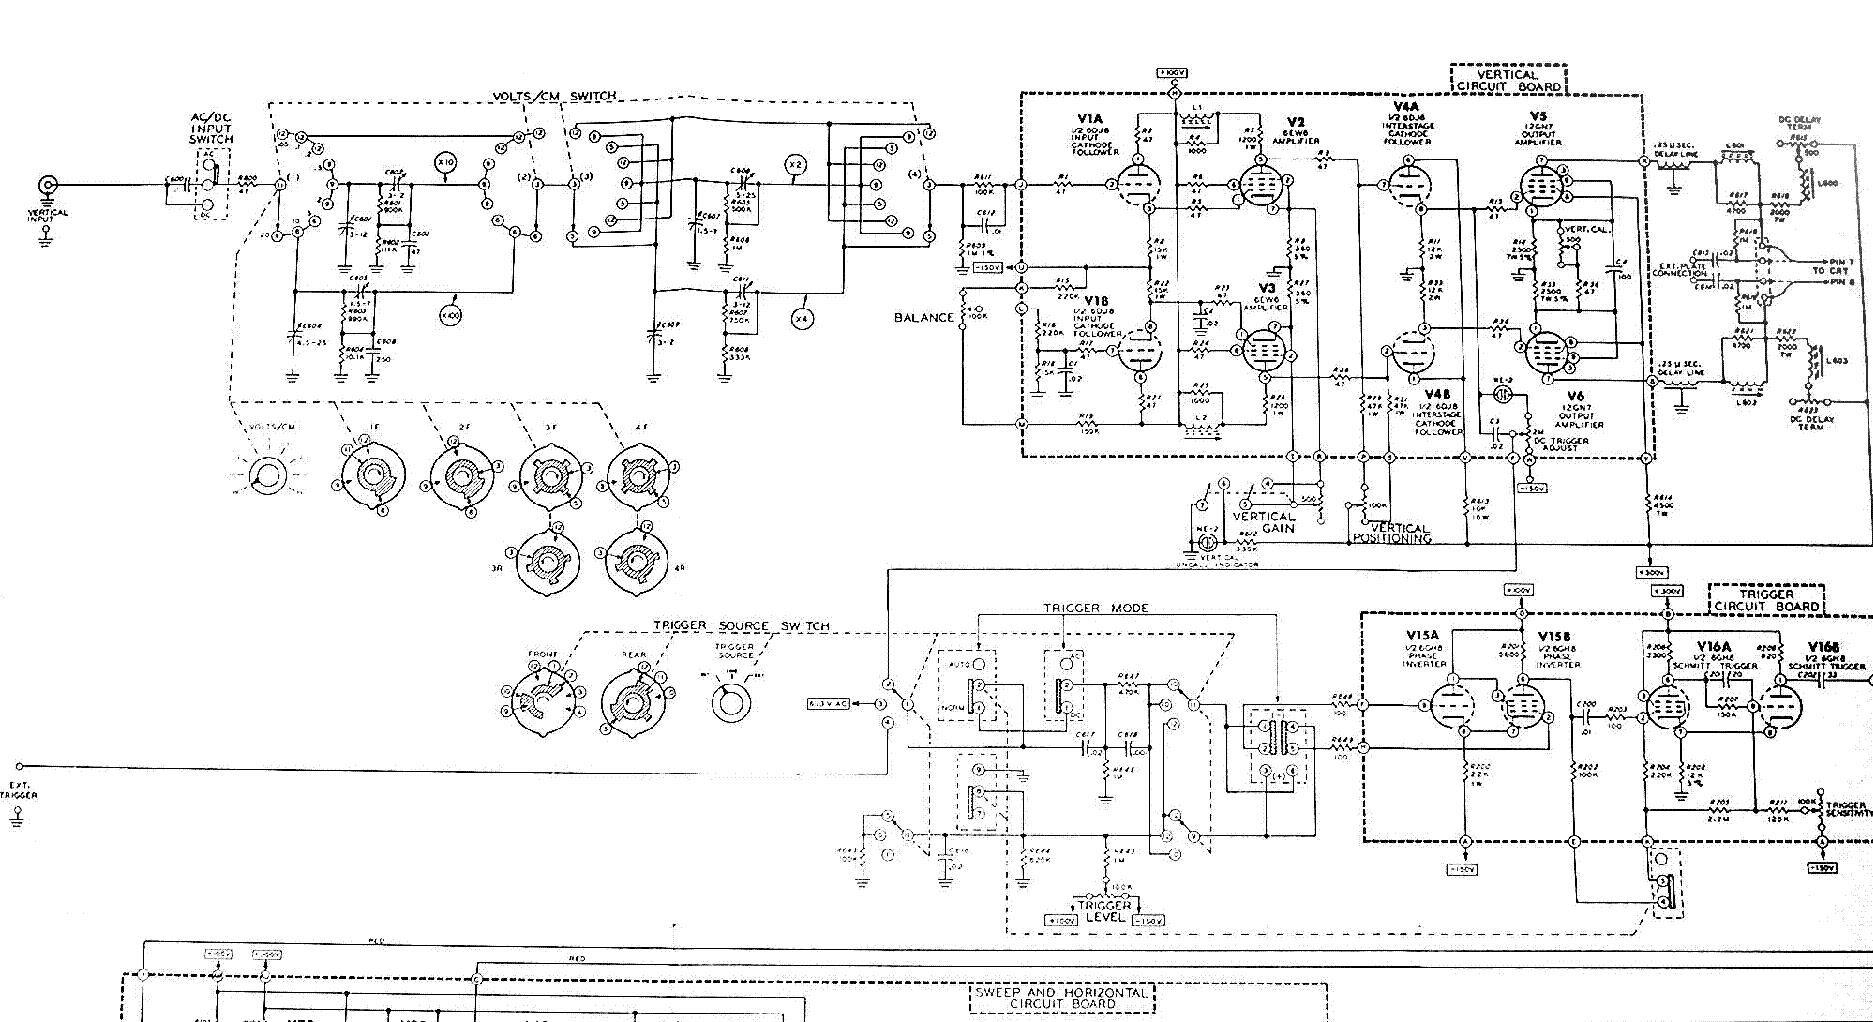 heathkit_io-14_laboratory_oscilloscope_sch.pdf_1 Oscilloscope Schematic on